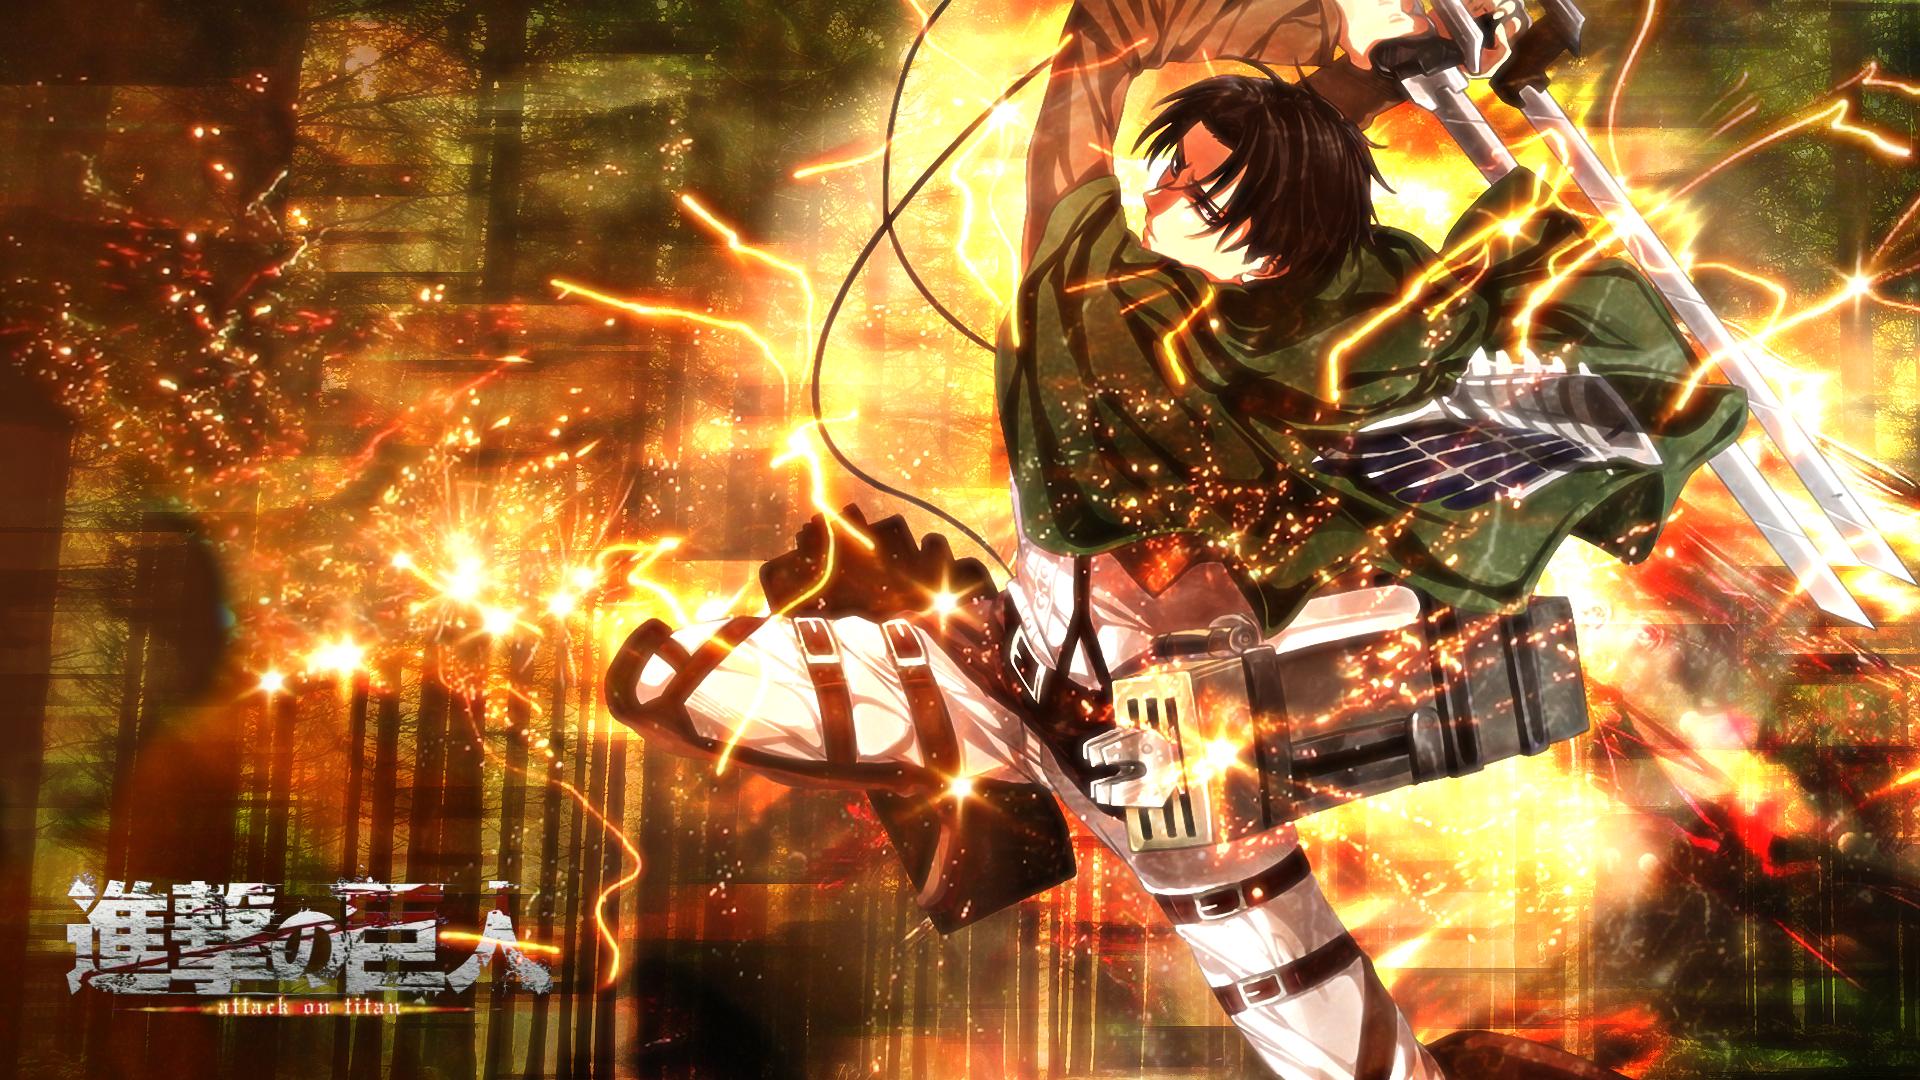 Levi Attack On Titan Wallpaper By Skeptec On Deviantart